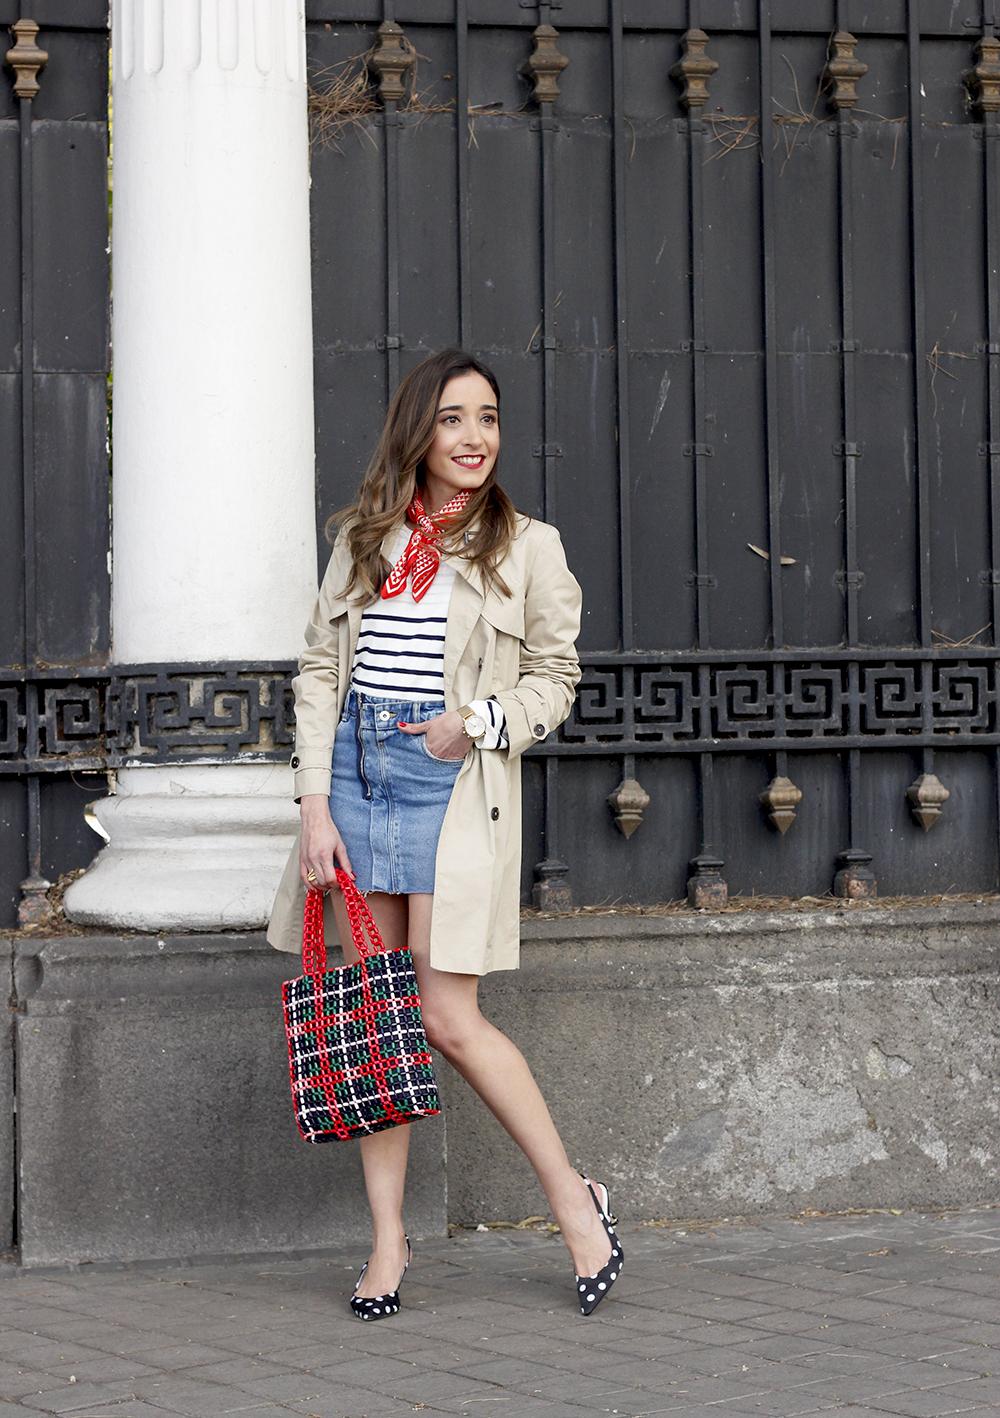 trench outfit denim skirt kitten heels striped sweater spring 03